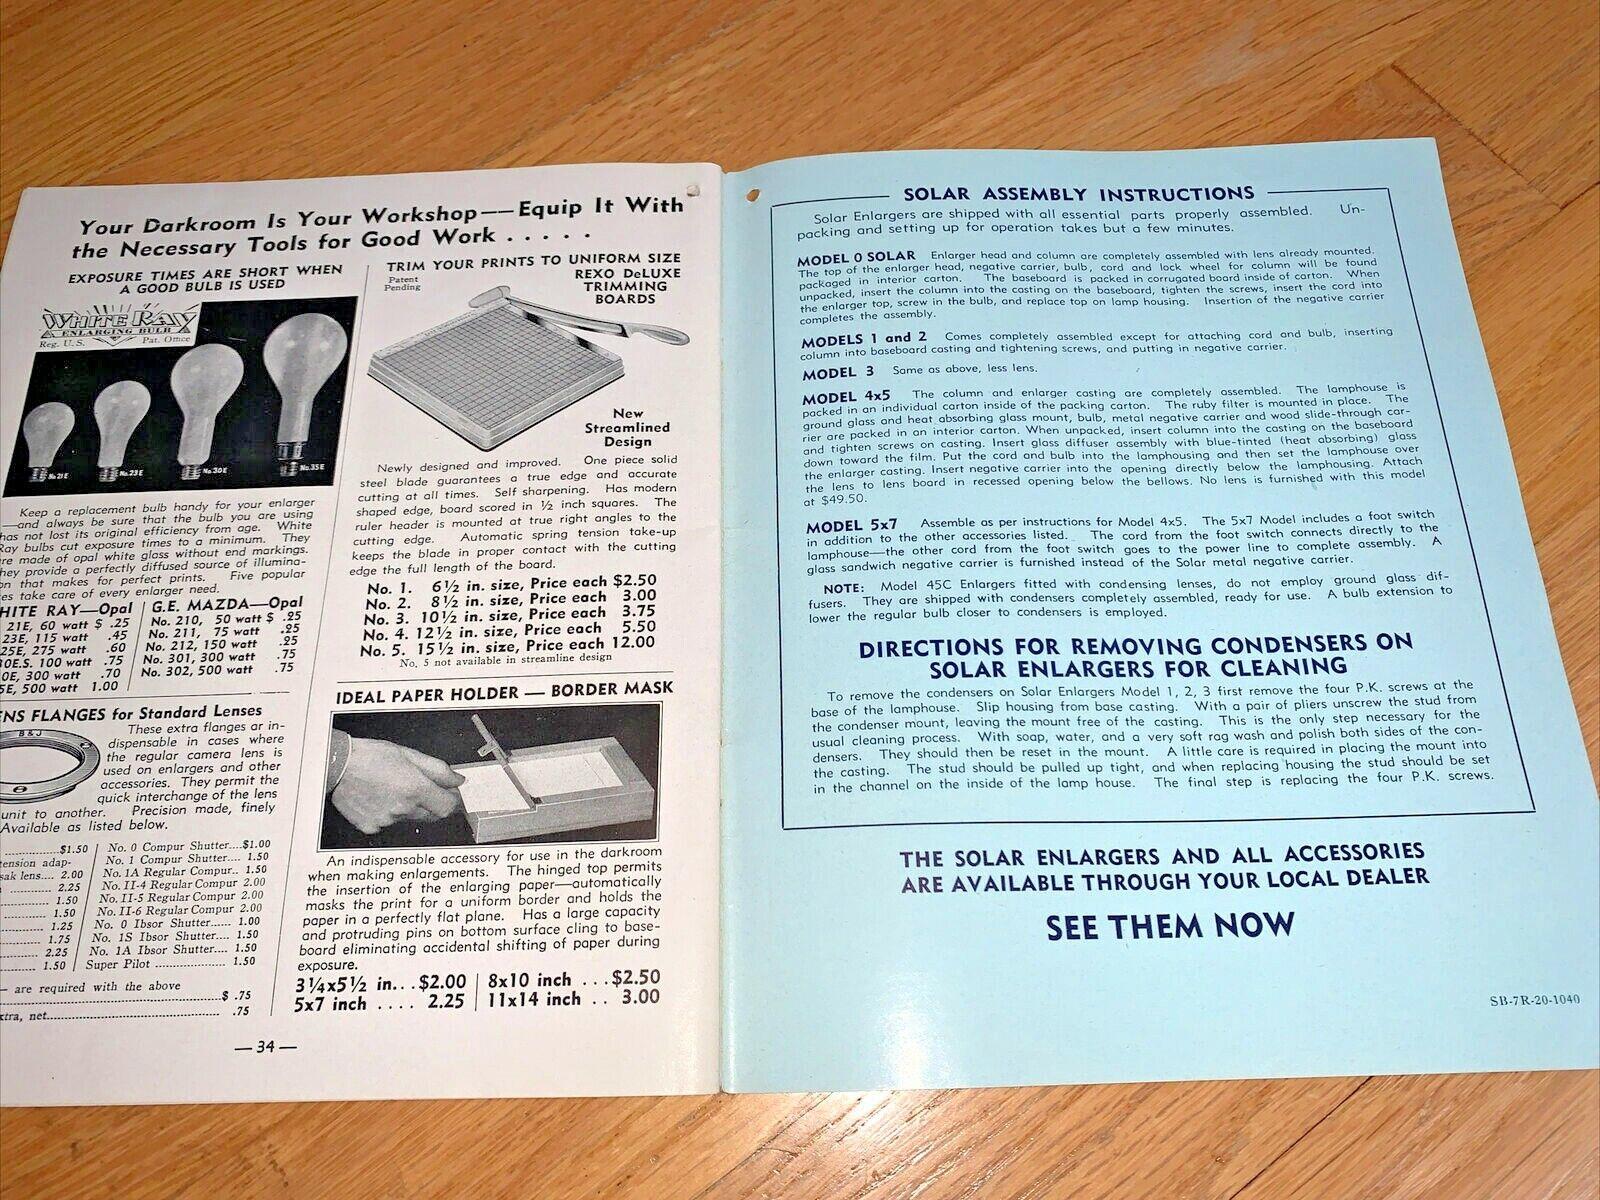 1940 BURKE JAMES - PHOTOGRAPHIC ENLARGING EQUIPMENT Brochure 34 Pages - $24.95